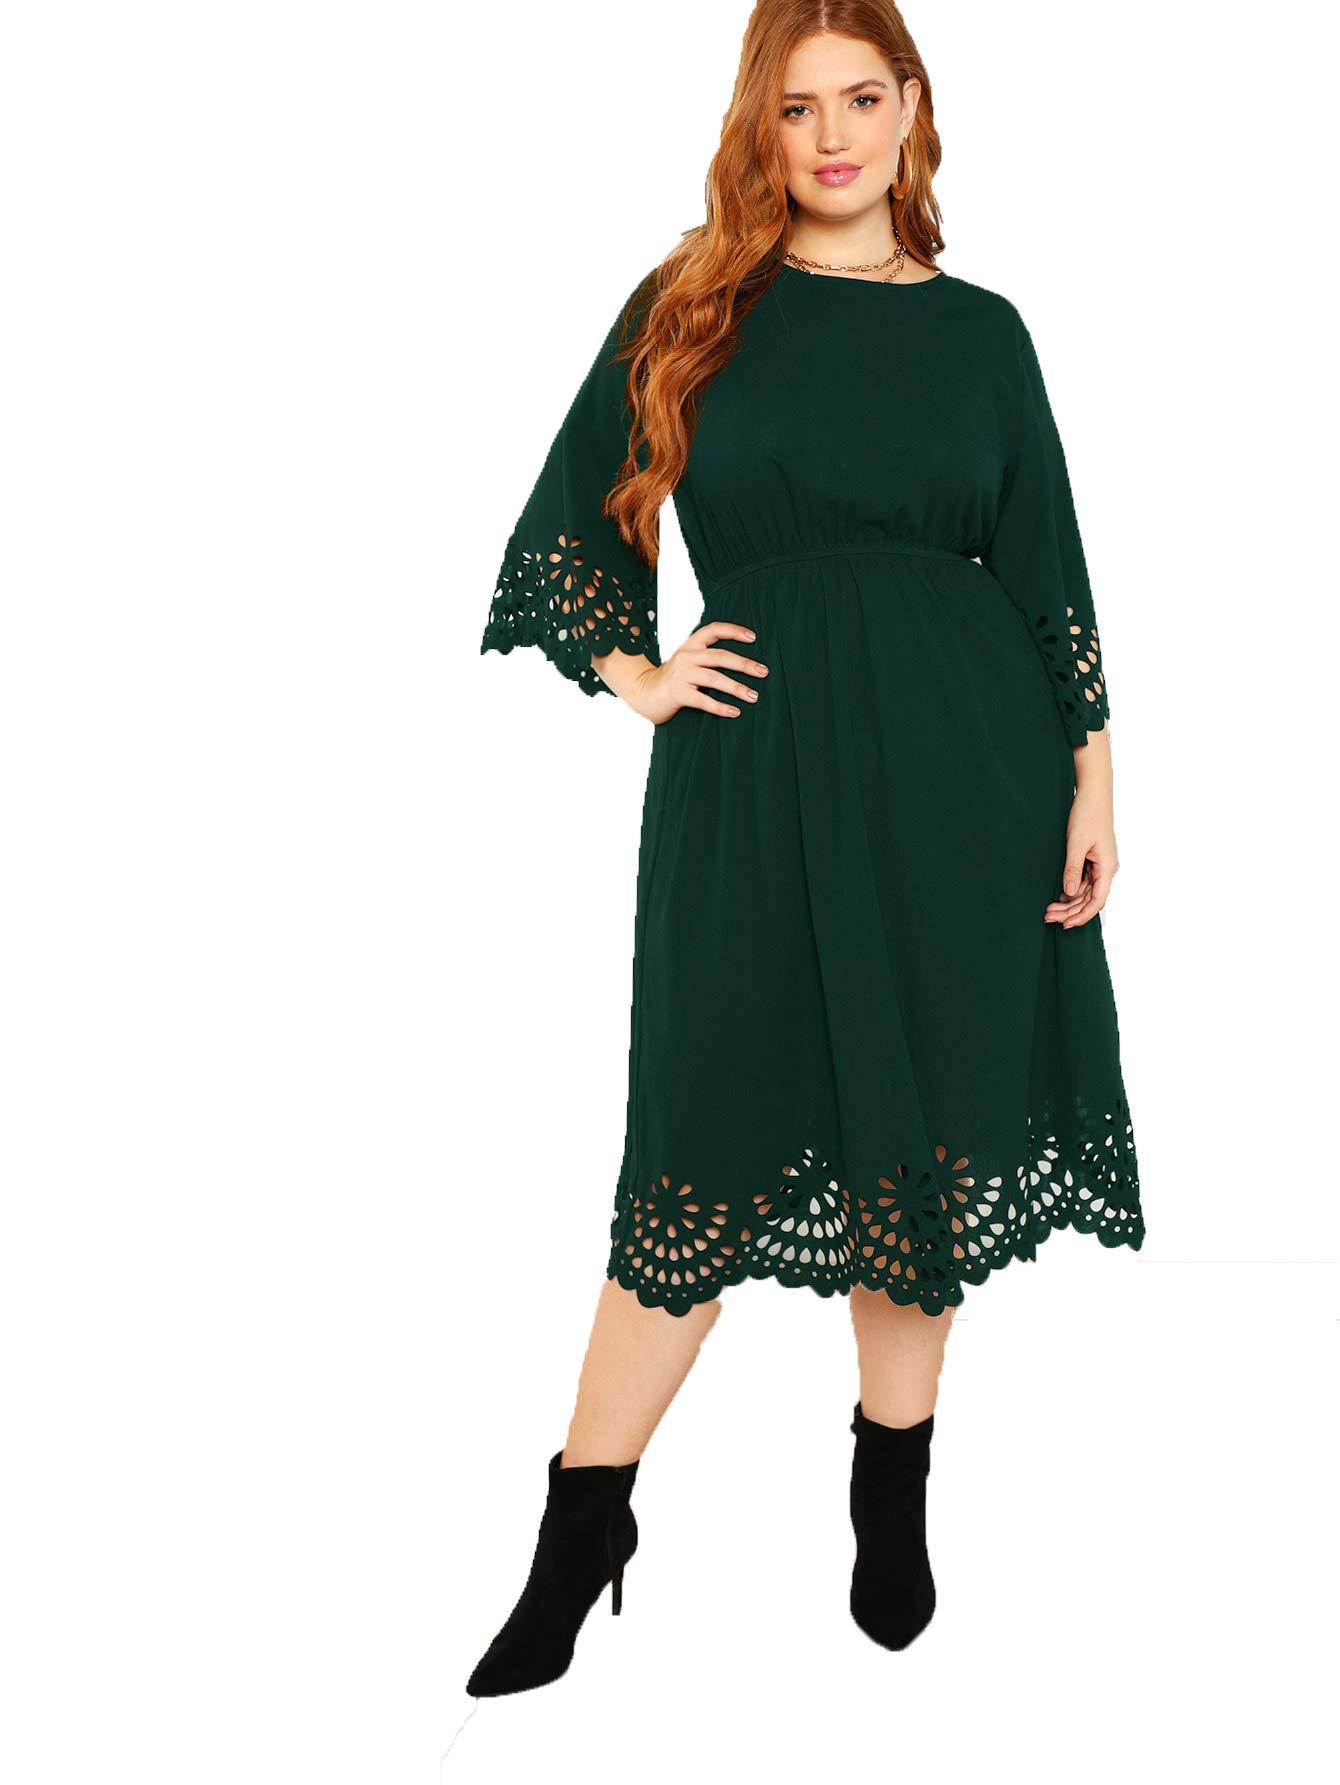 Romwe Women\'s Solid Plus Size Scallop Cut Out Dress Green 3XL